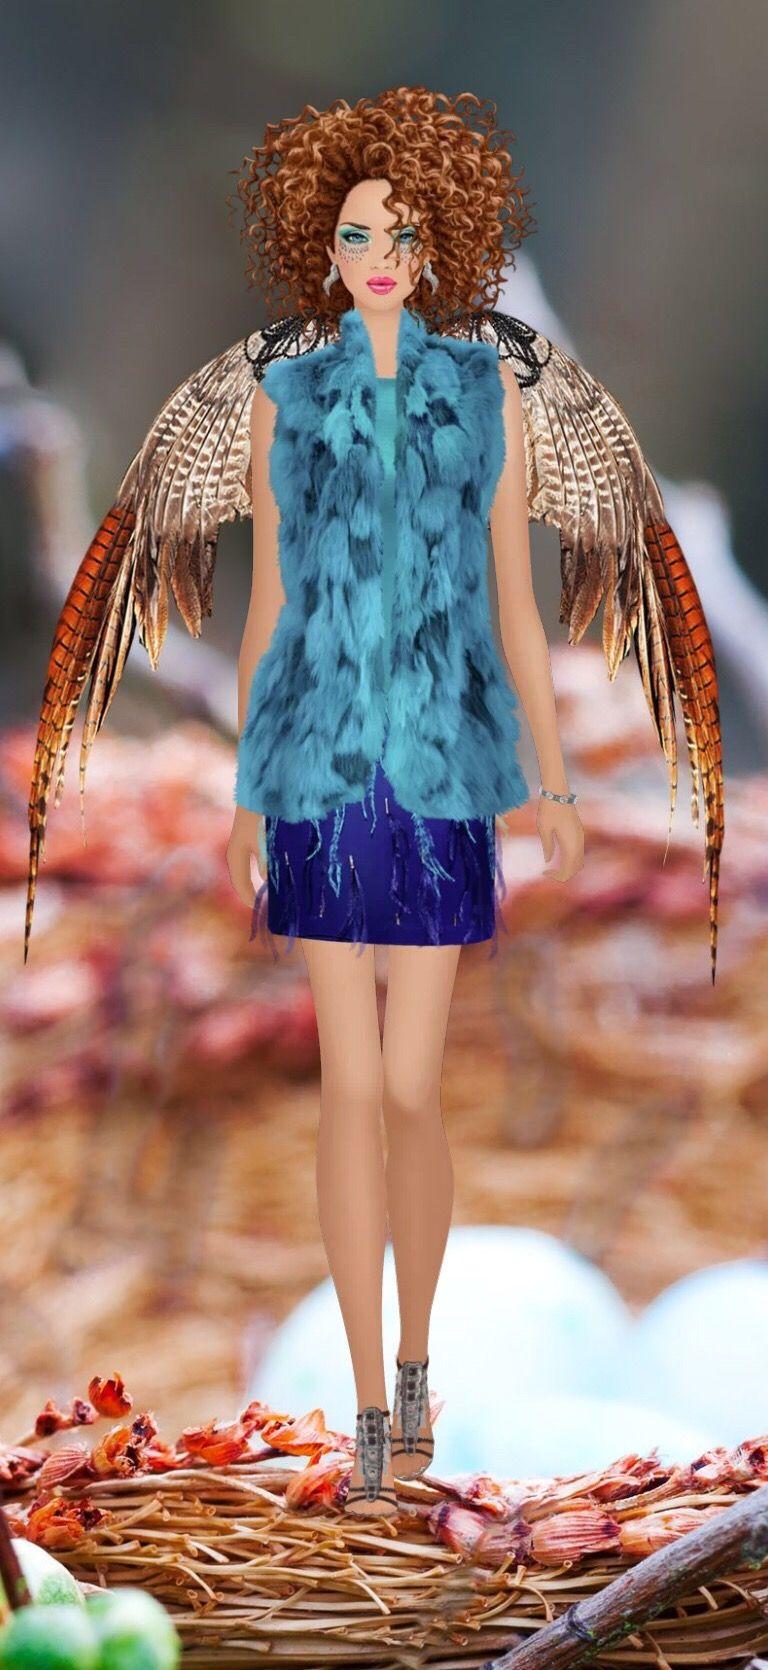 Pin by LtnStyle on Estilo Covet fashion, Fashion